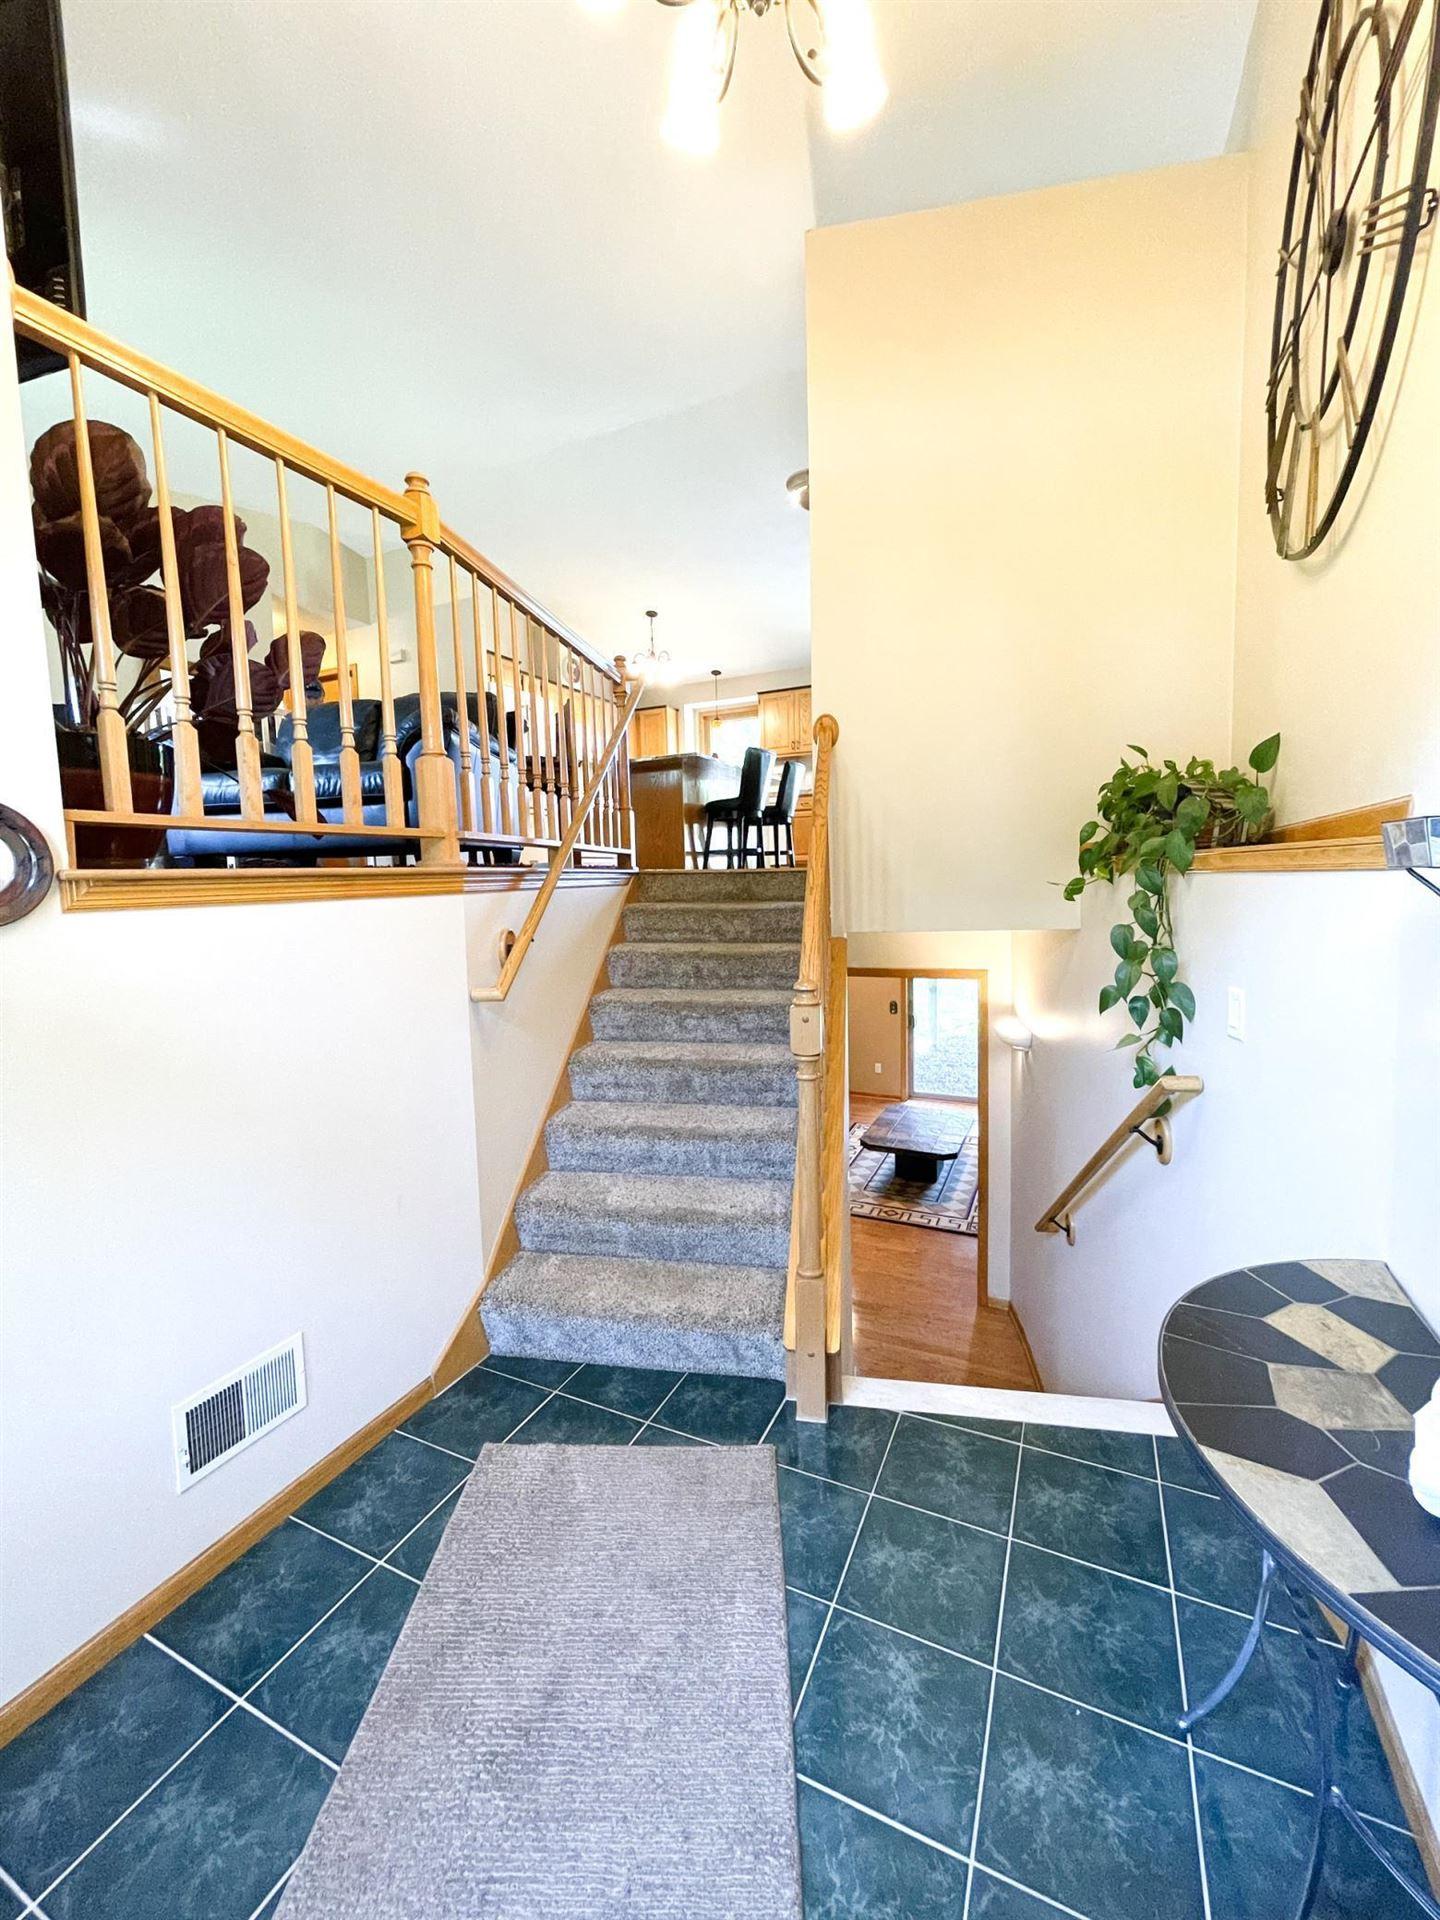 Photo of 8739 Norwood Lane N, Maple Grove, MN 55369 (MLS # 6103003)